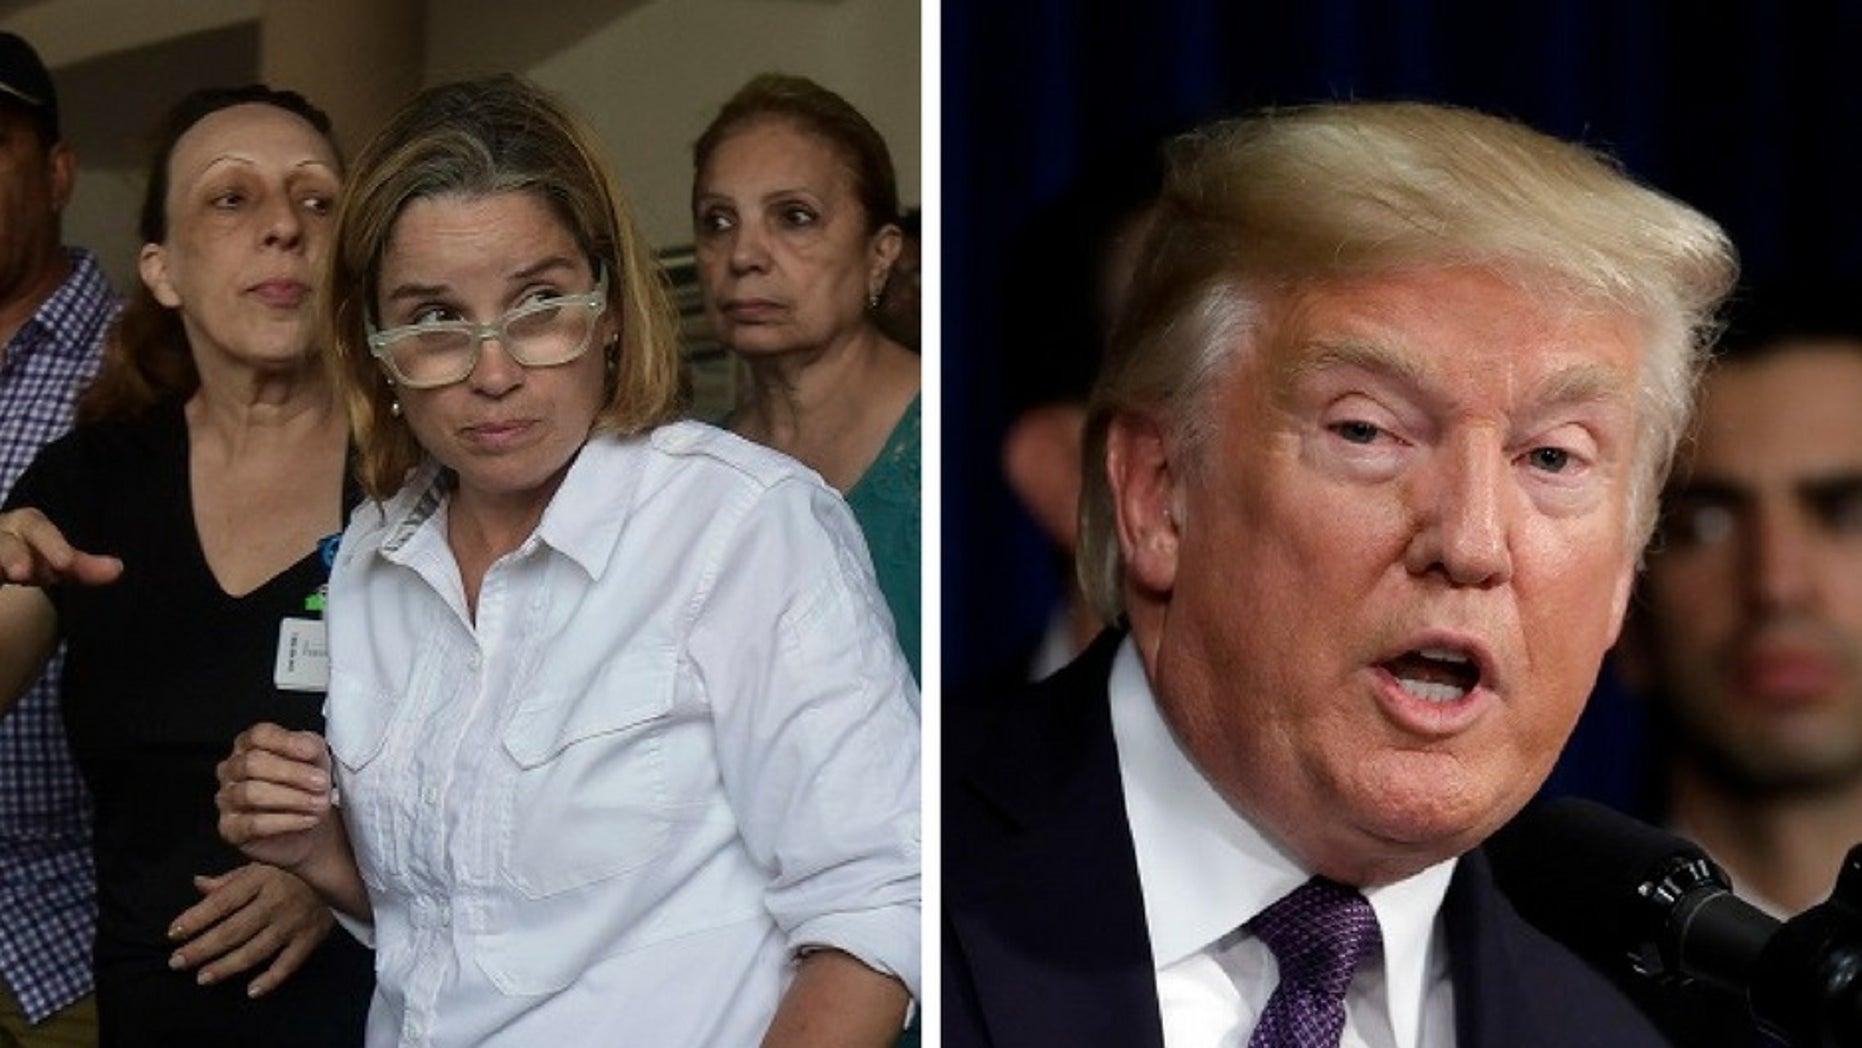 San Juan Mayor Carmen Yulin Cruz donned 'nasty' shirt during interview Wednesday in response to President Trump's tweet.